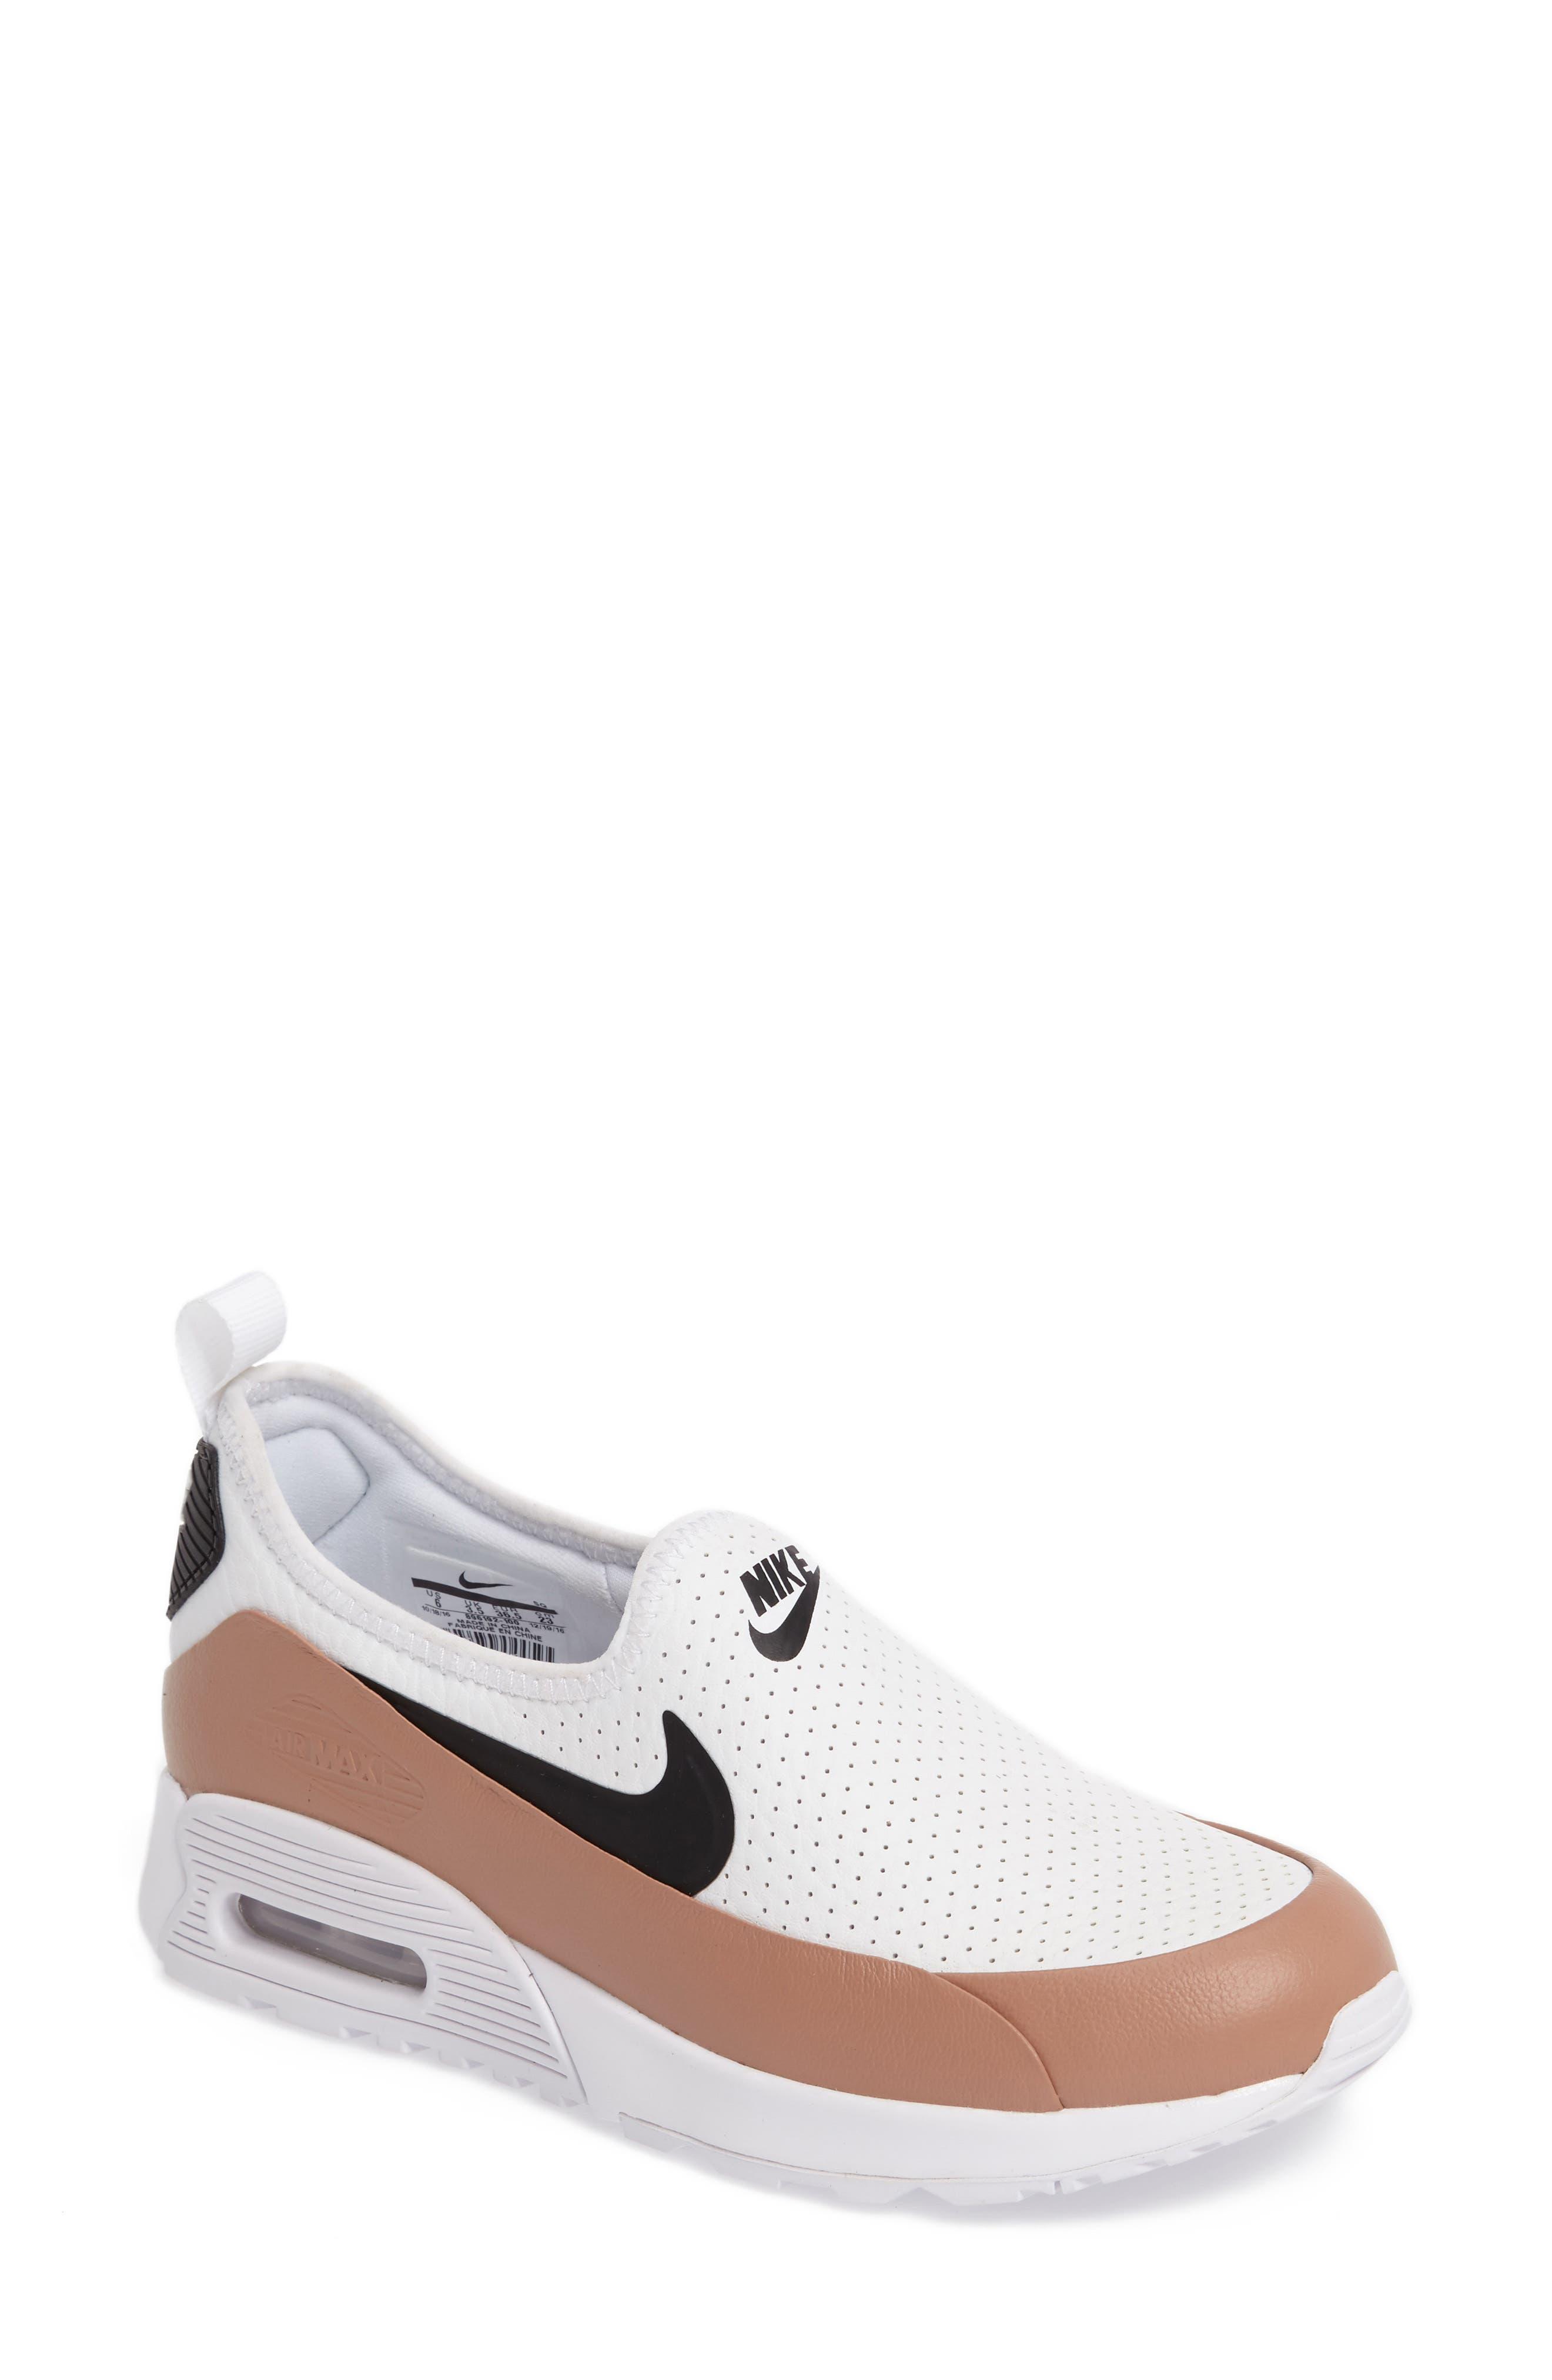 Nike Air Max 90 Ultra 2.0 Slip-On Sneaker (Women)